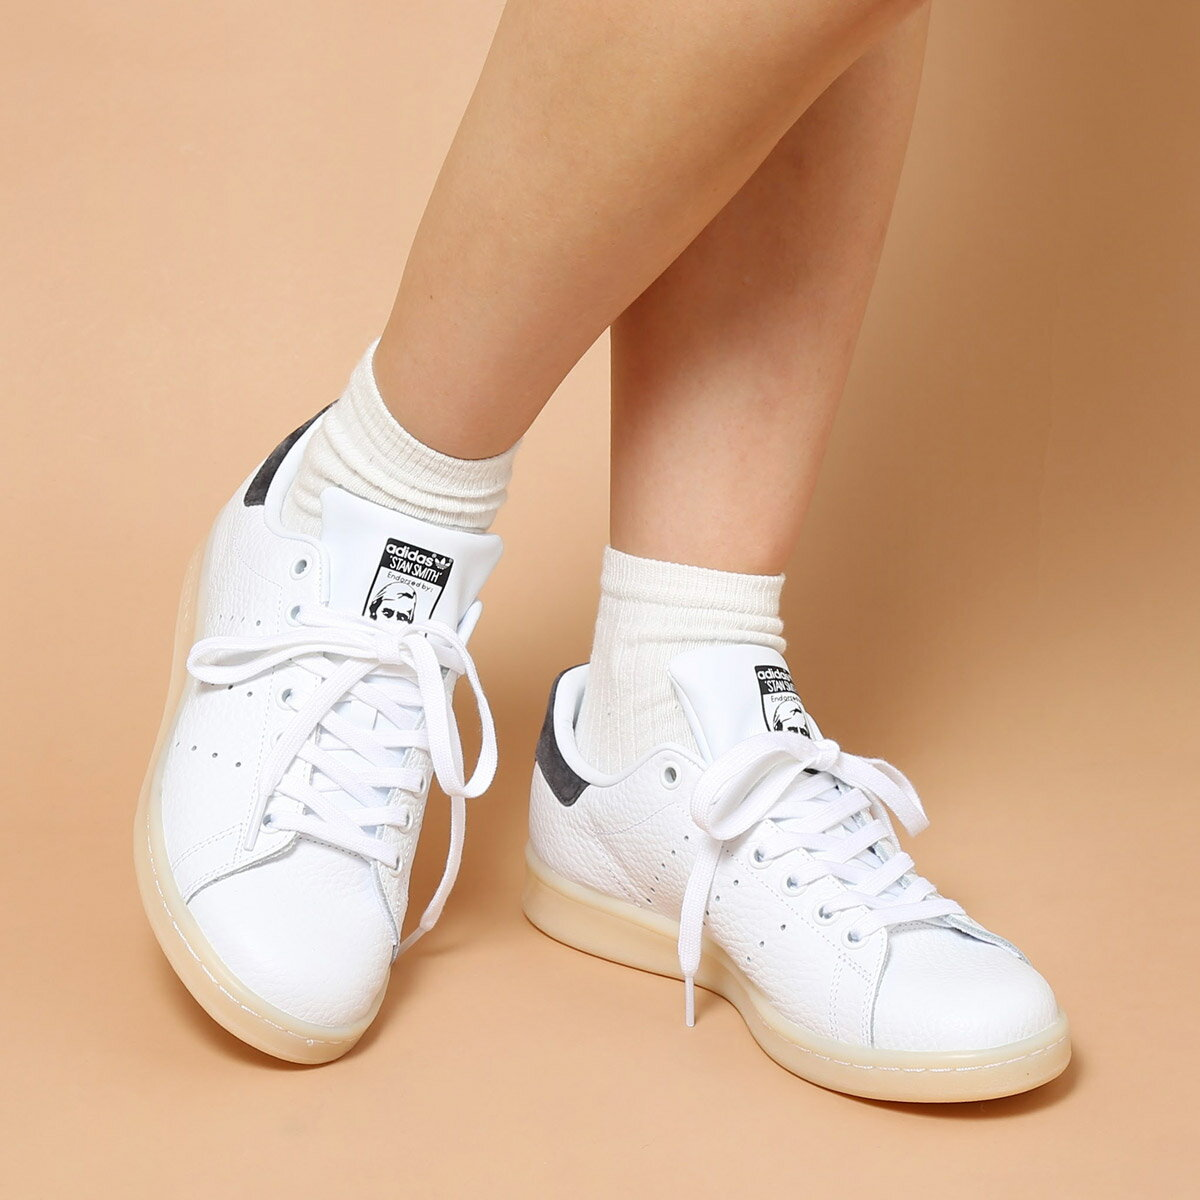 adidas Originals STAN SMITH(アディダス オリジナルス スタンスミス)(Running White/Running White/Utility Black)【メンズ レディース スニーカー】17SS-I